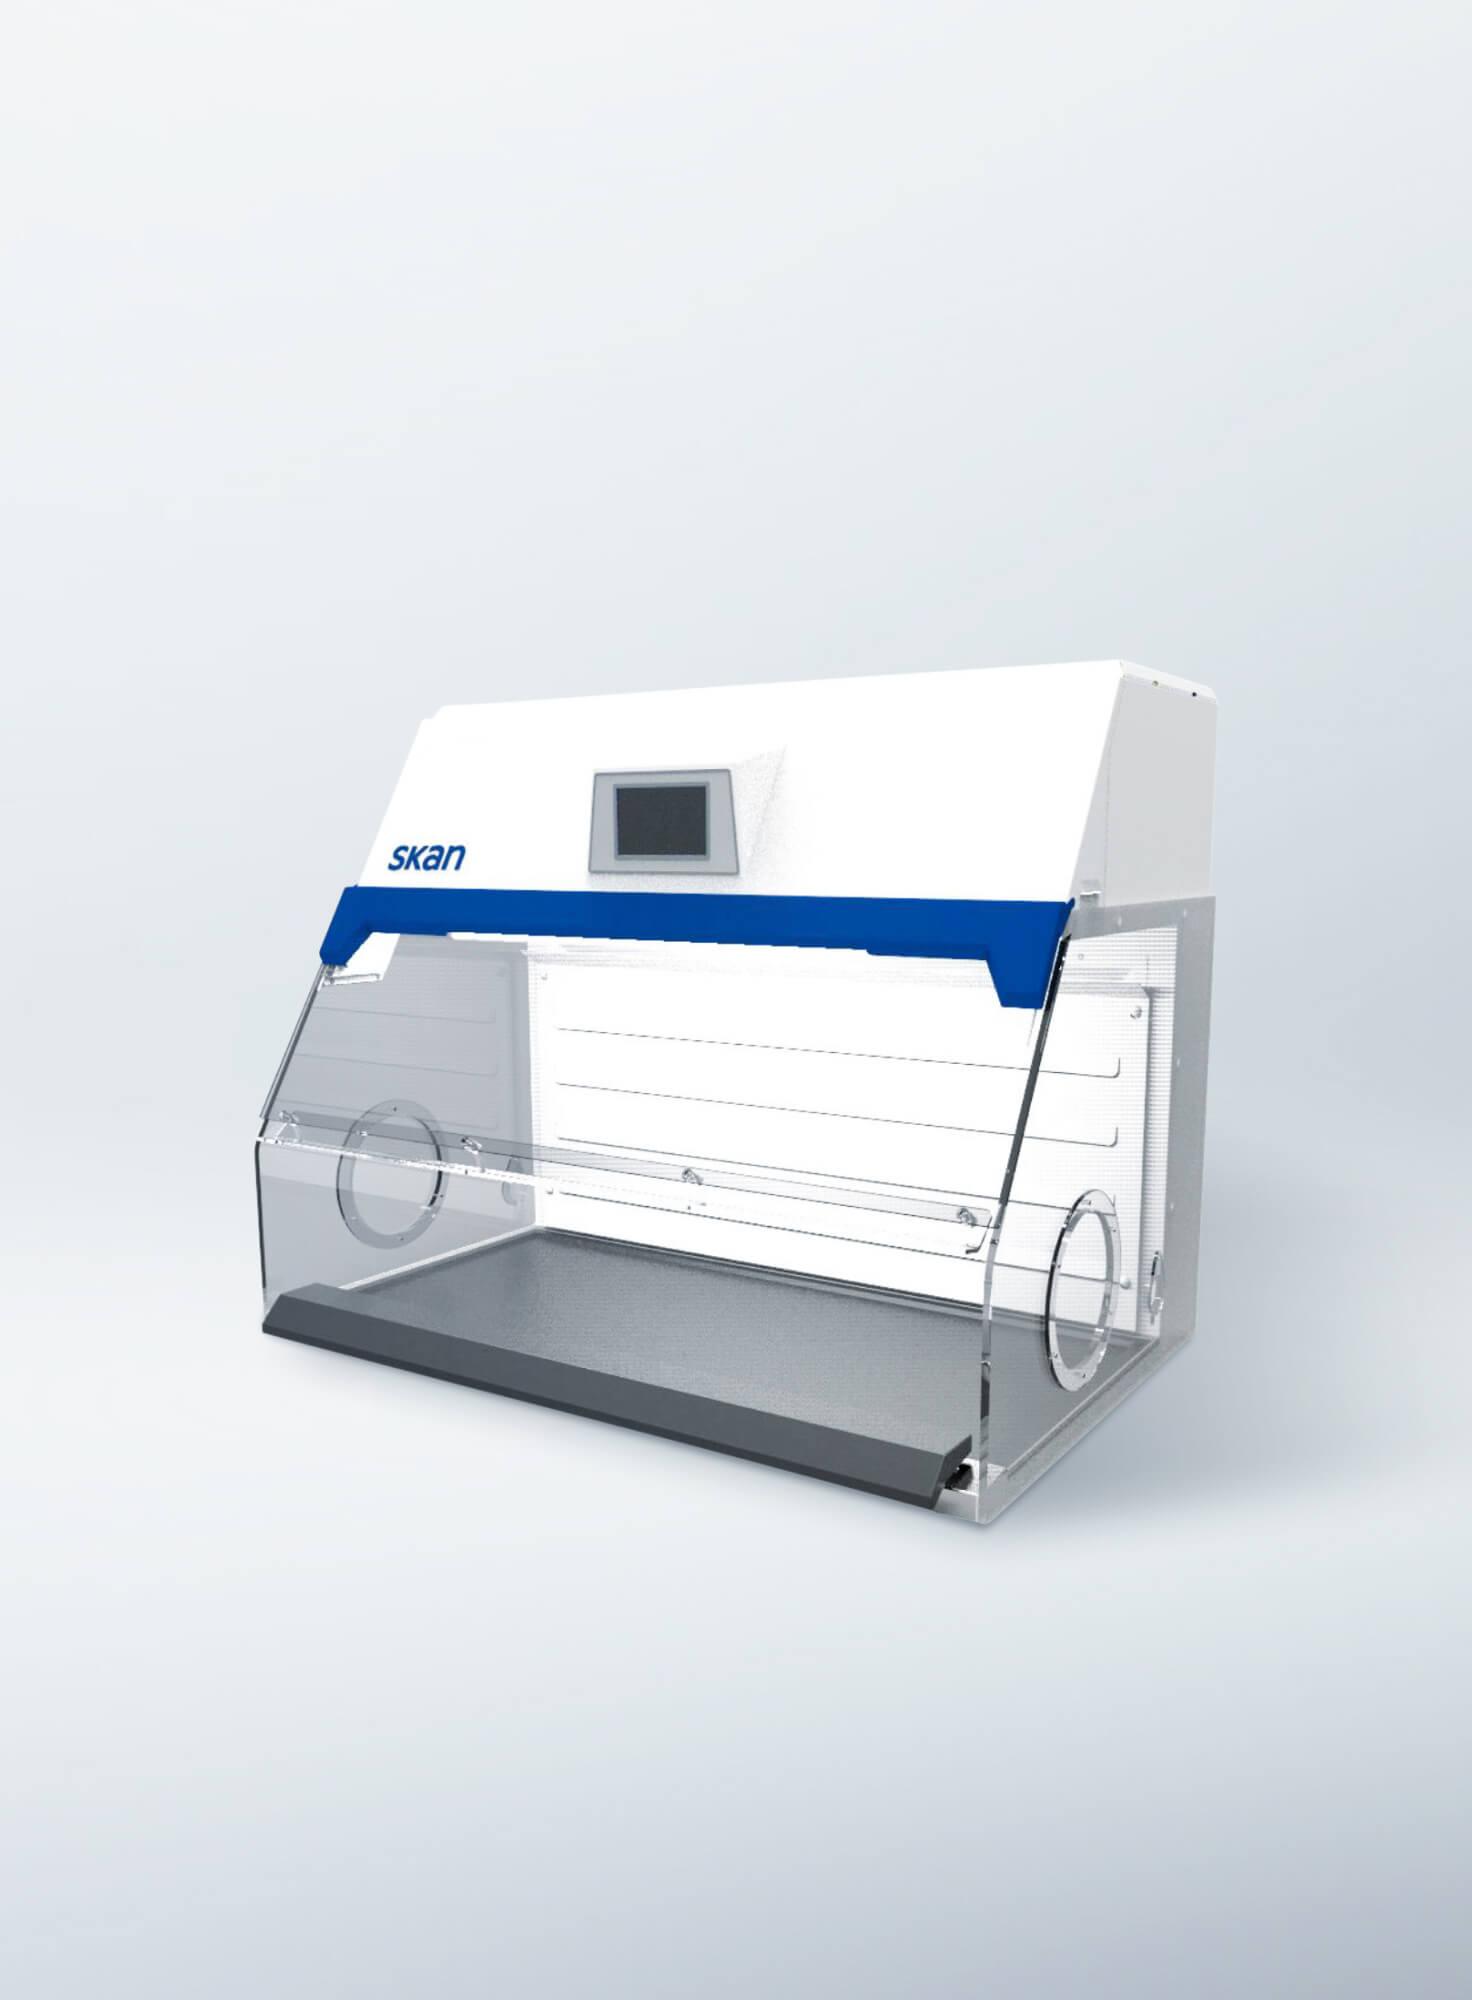 f_skan-labor-produkte-abzuege-hfcpro